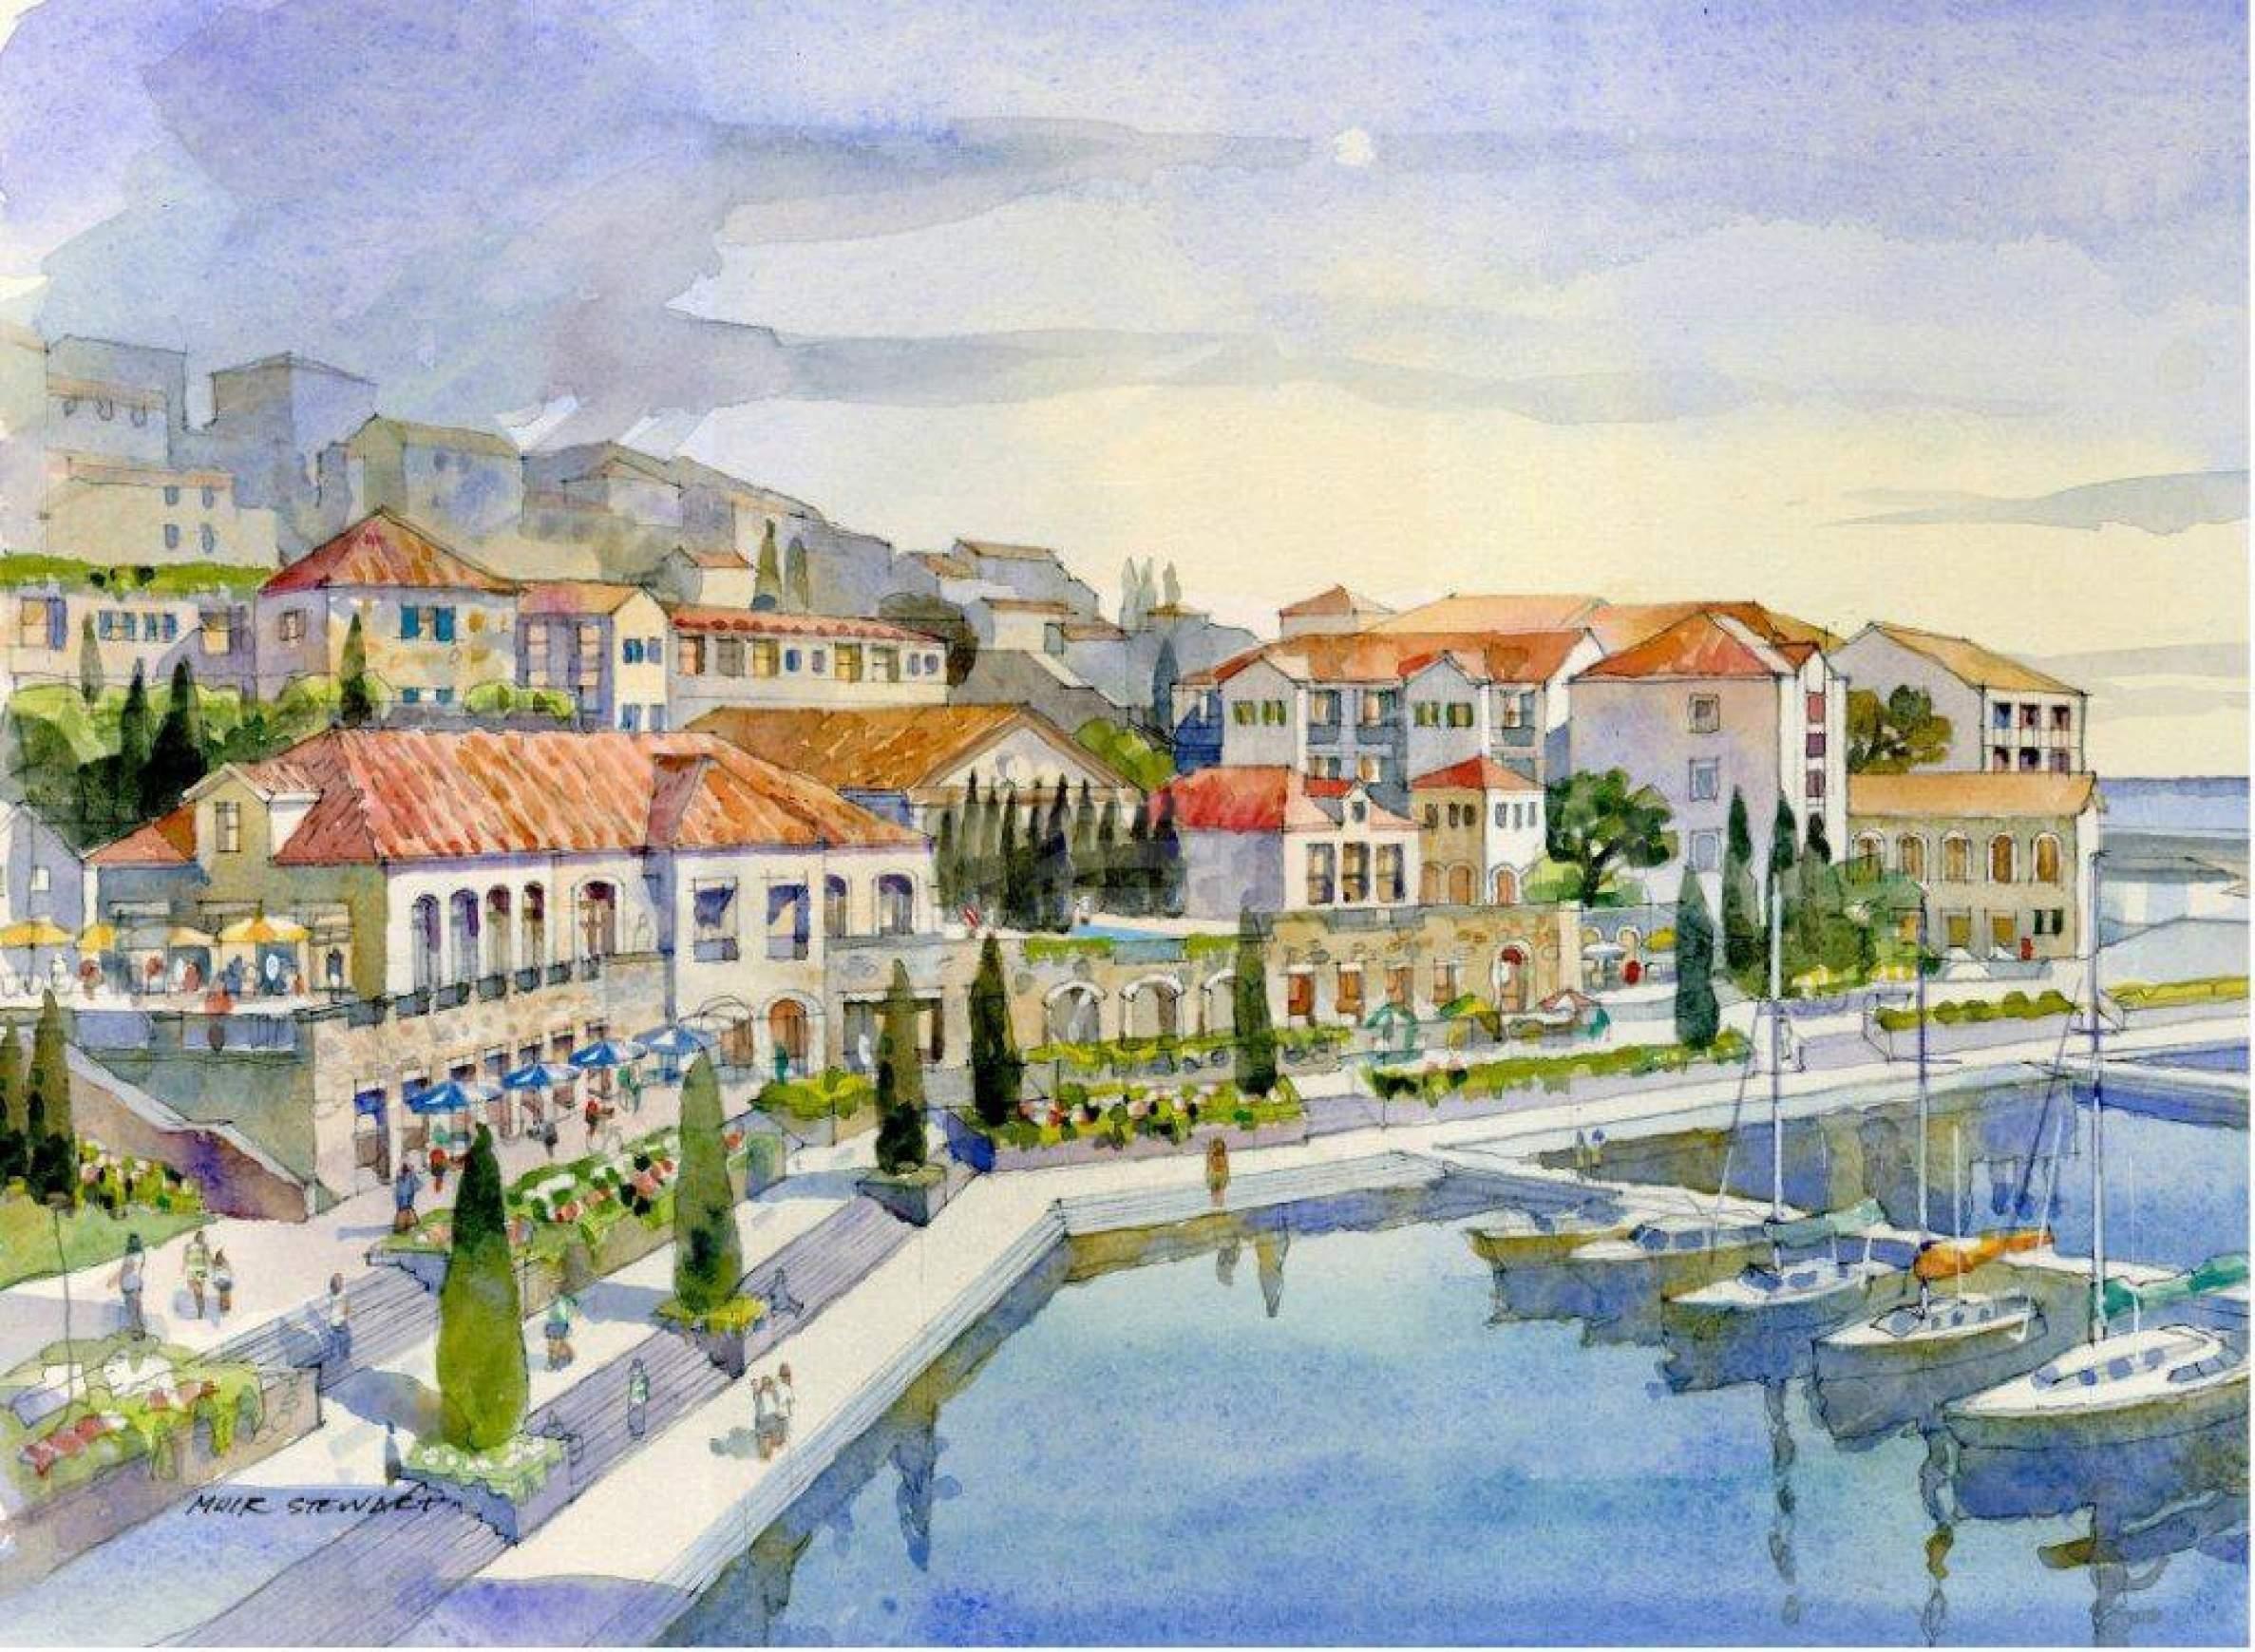 Hotel condo rooms in world-class luxury resort on the Adriatic Coast1 - Stonehard